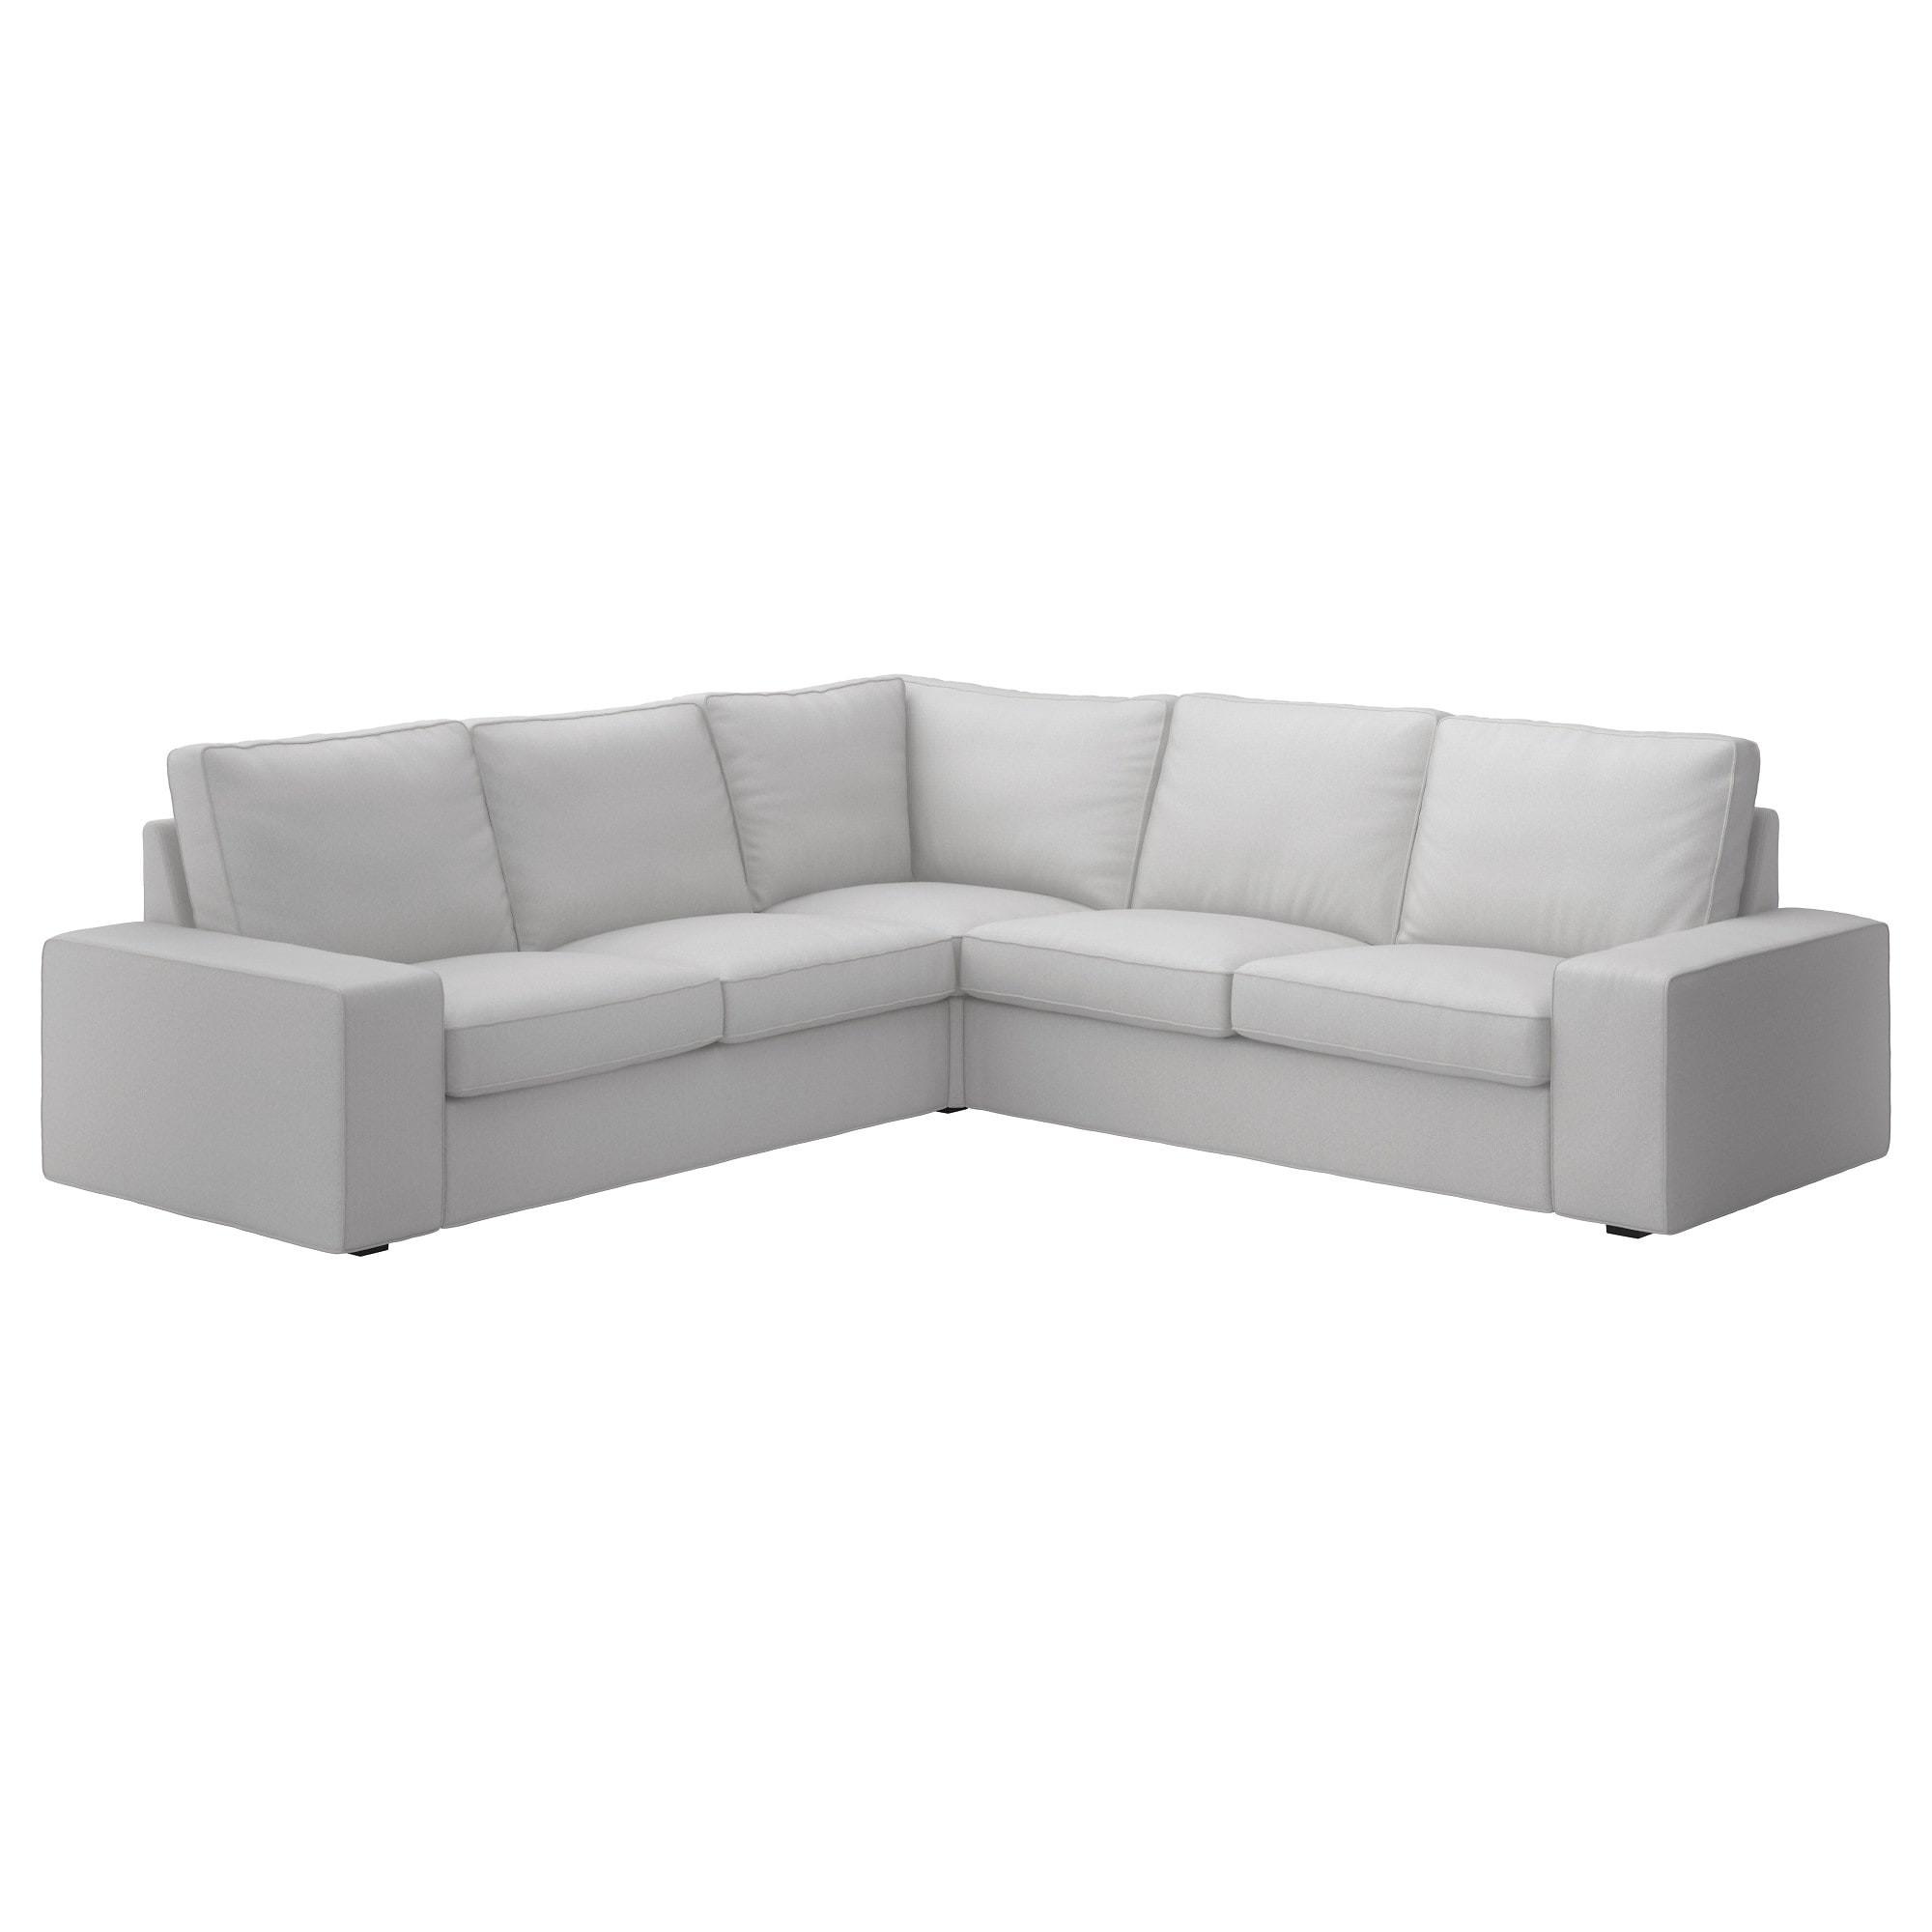 Best ideas about Ikea Sectional Sofa . Save or Pin KIVIK Corner sofa 4 seat Ramna light grey IKEA Now.